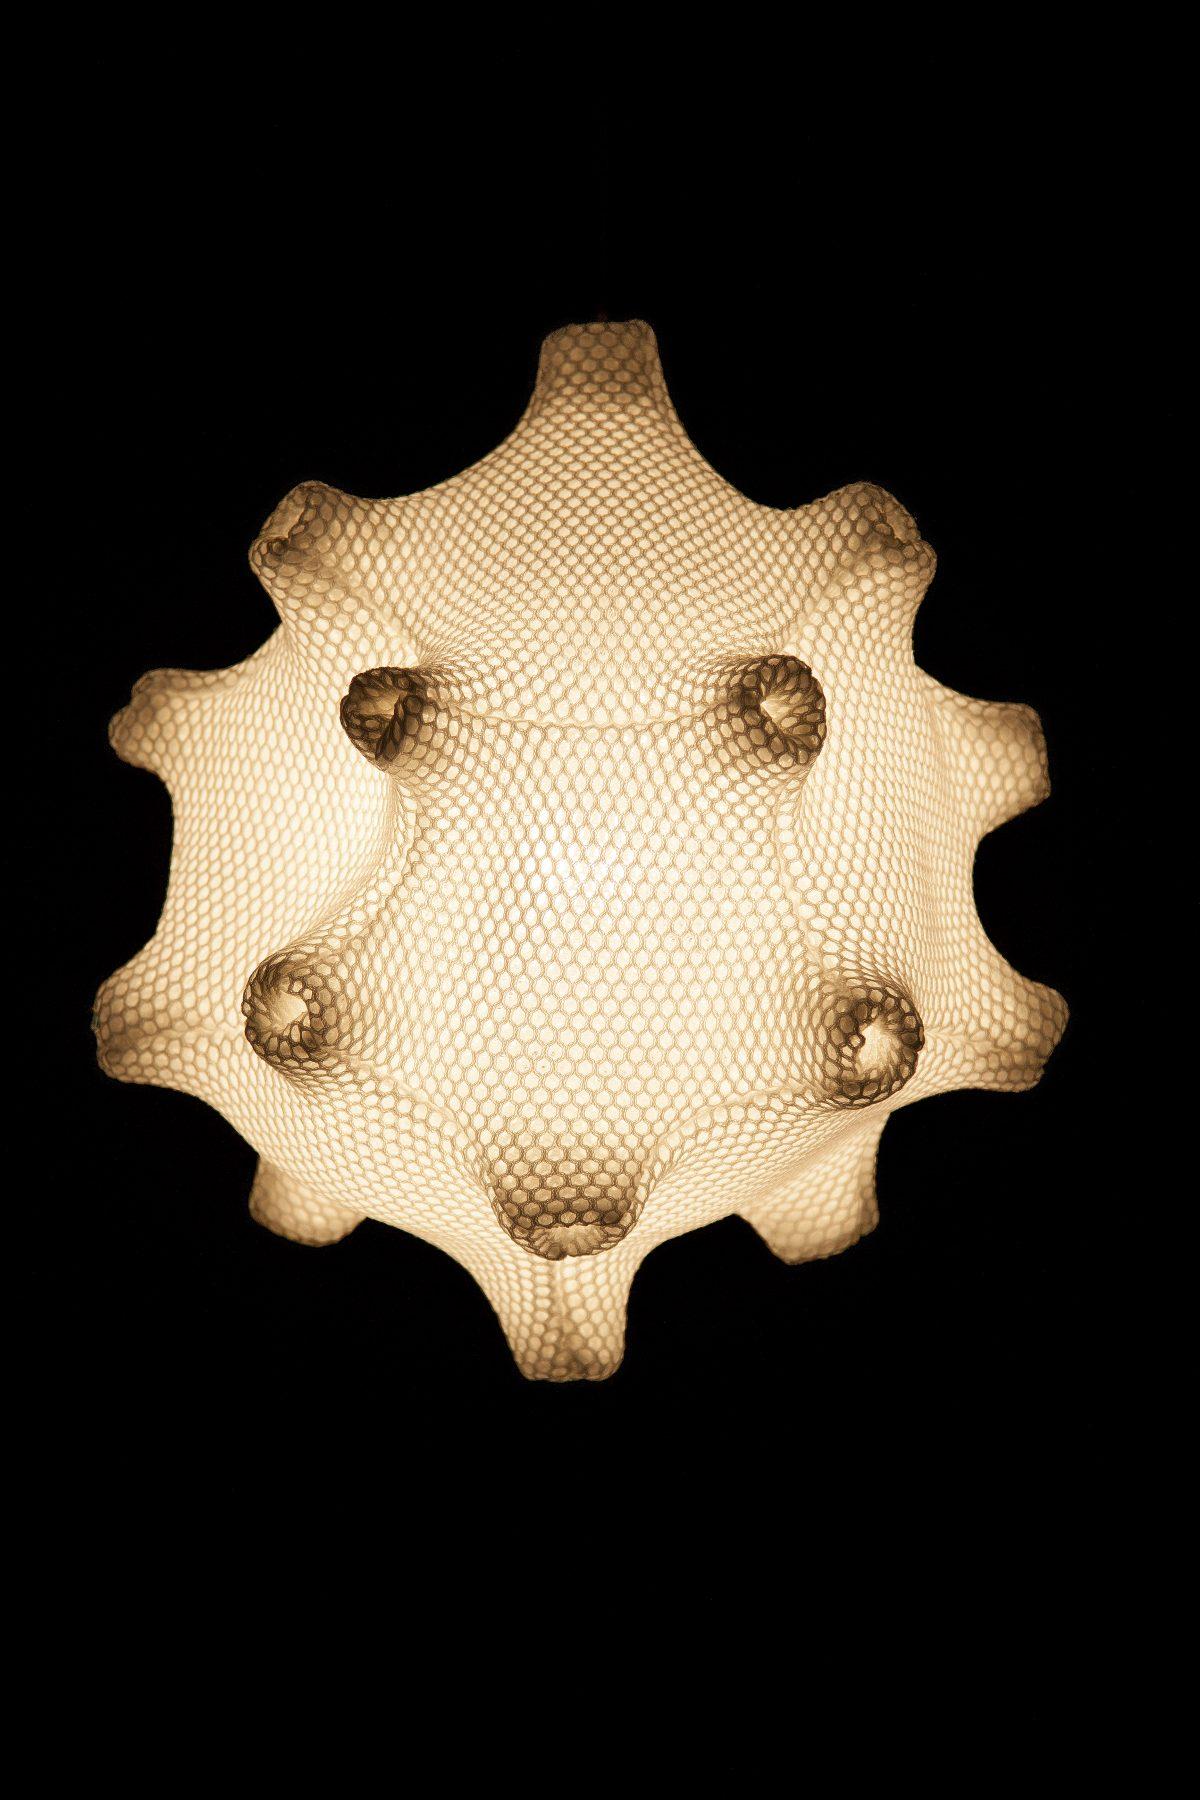 Radiolaria Tentaculus minimus glow-in-the-dark hanglamp van Bernotat